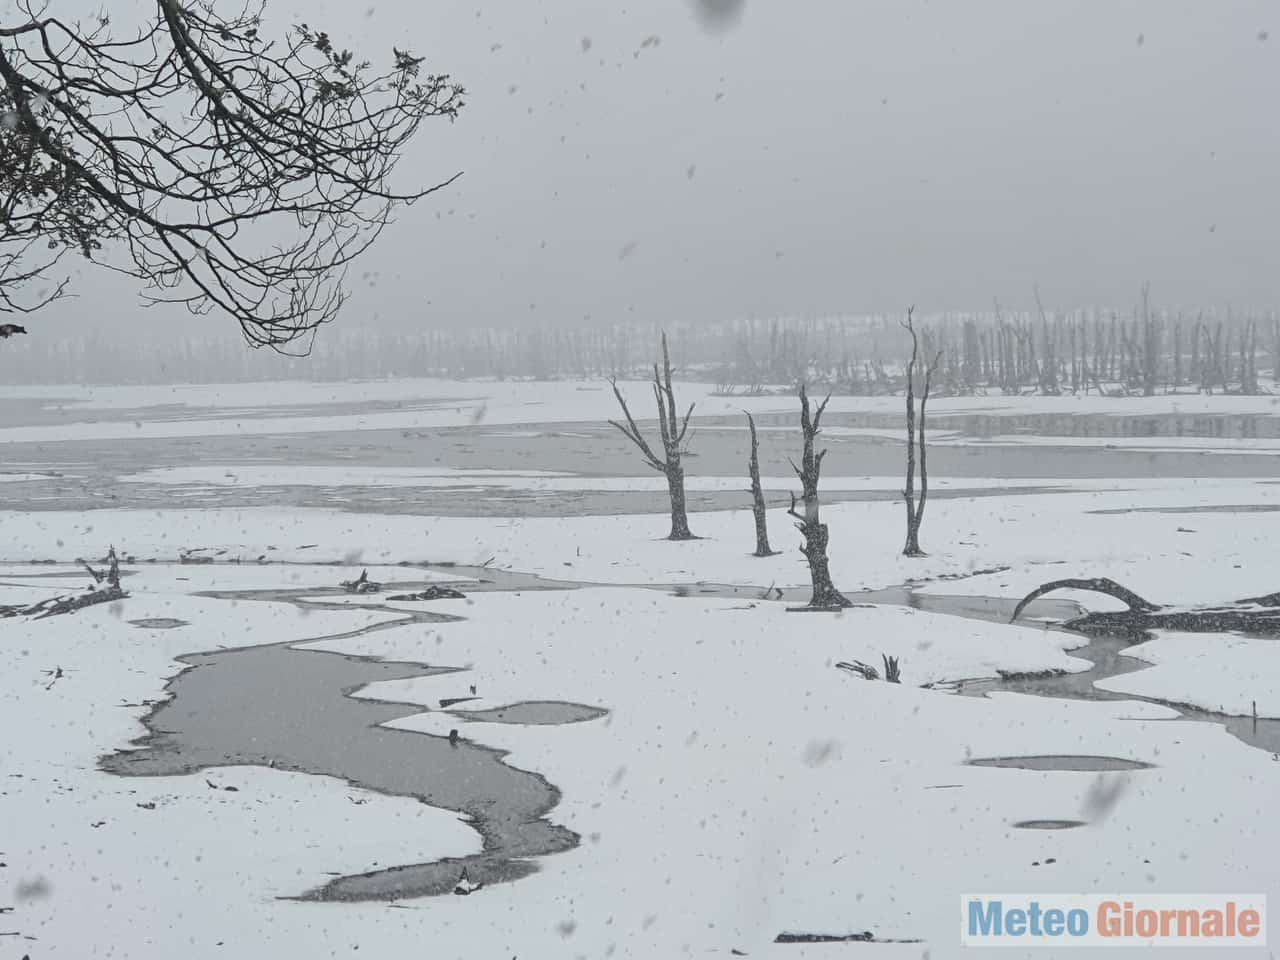 tasmania3 - Magia invernale australe. Meteo con neve fin quasi in pianura in Tasmania